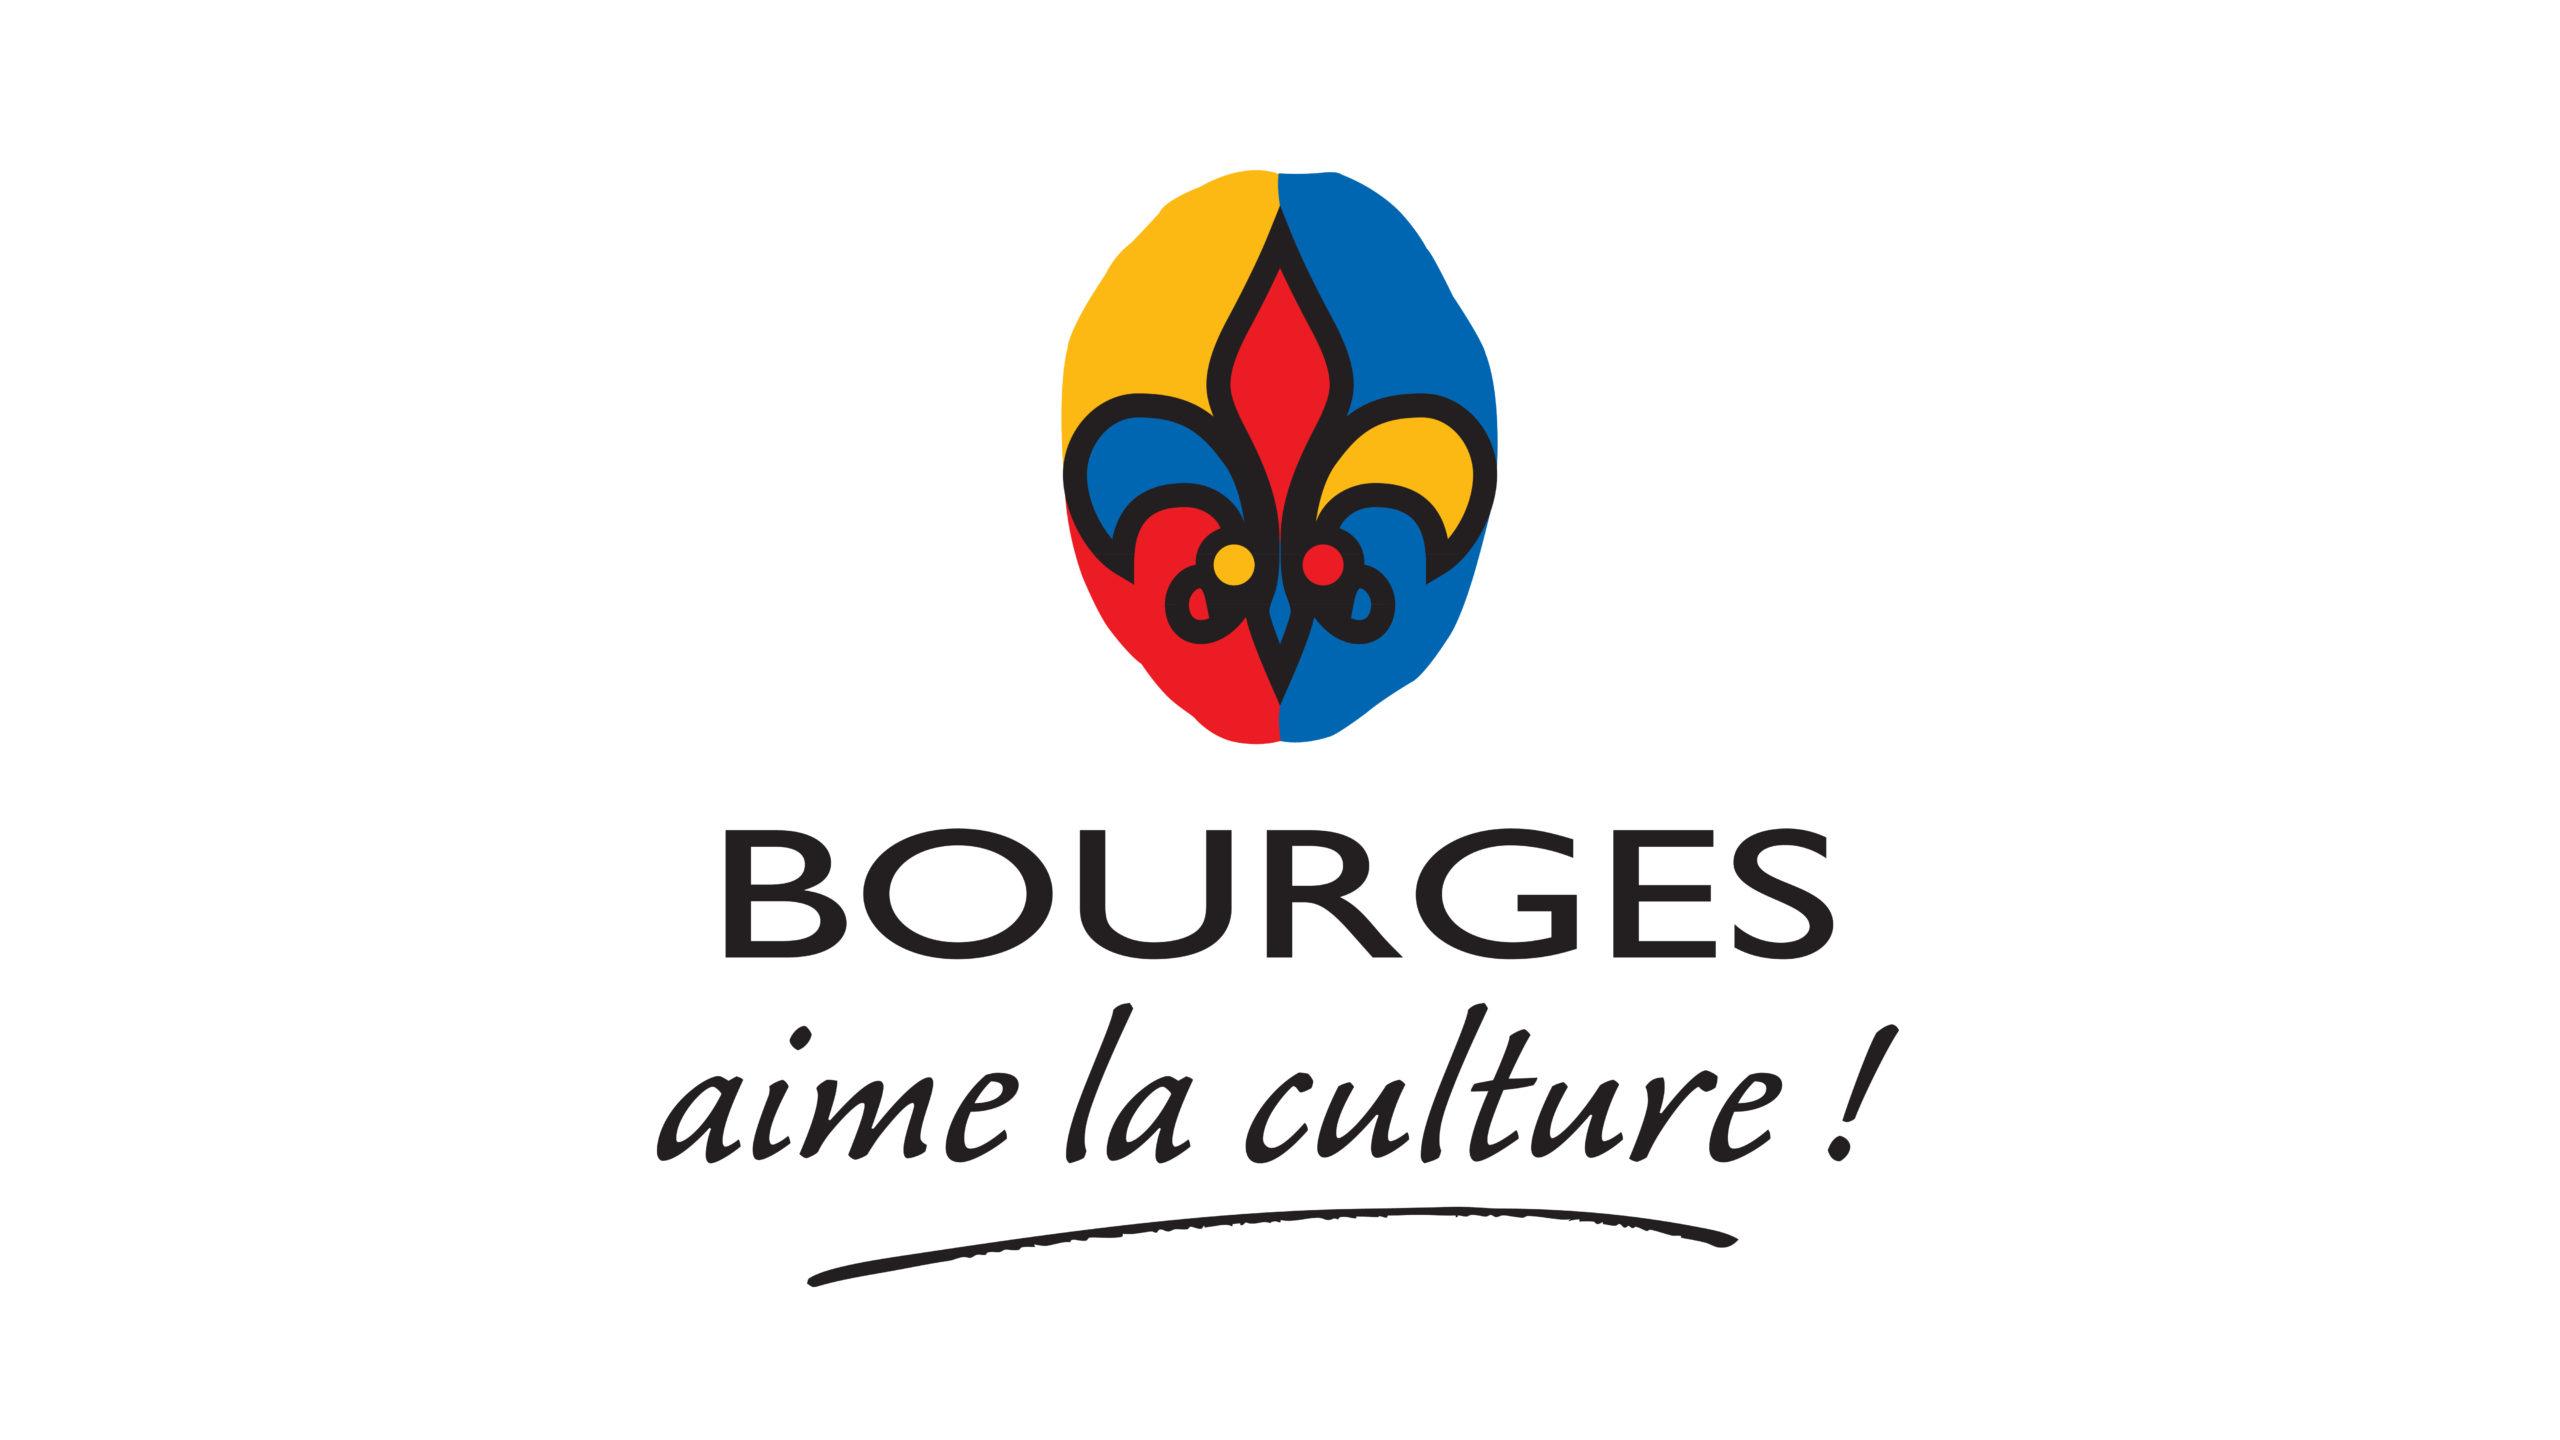 bourges-logo-01